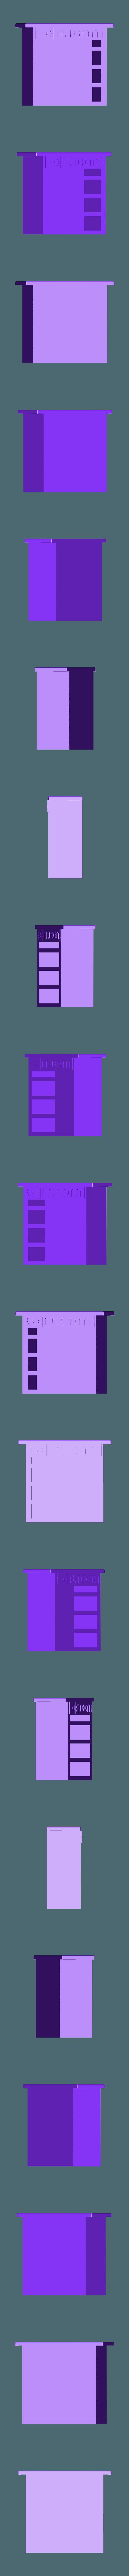 servante 1.stl Download free STL file FACOM maid 1/10 for garage 1/10 diorama • 3D printing model, RCGANG93